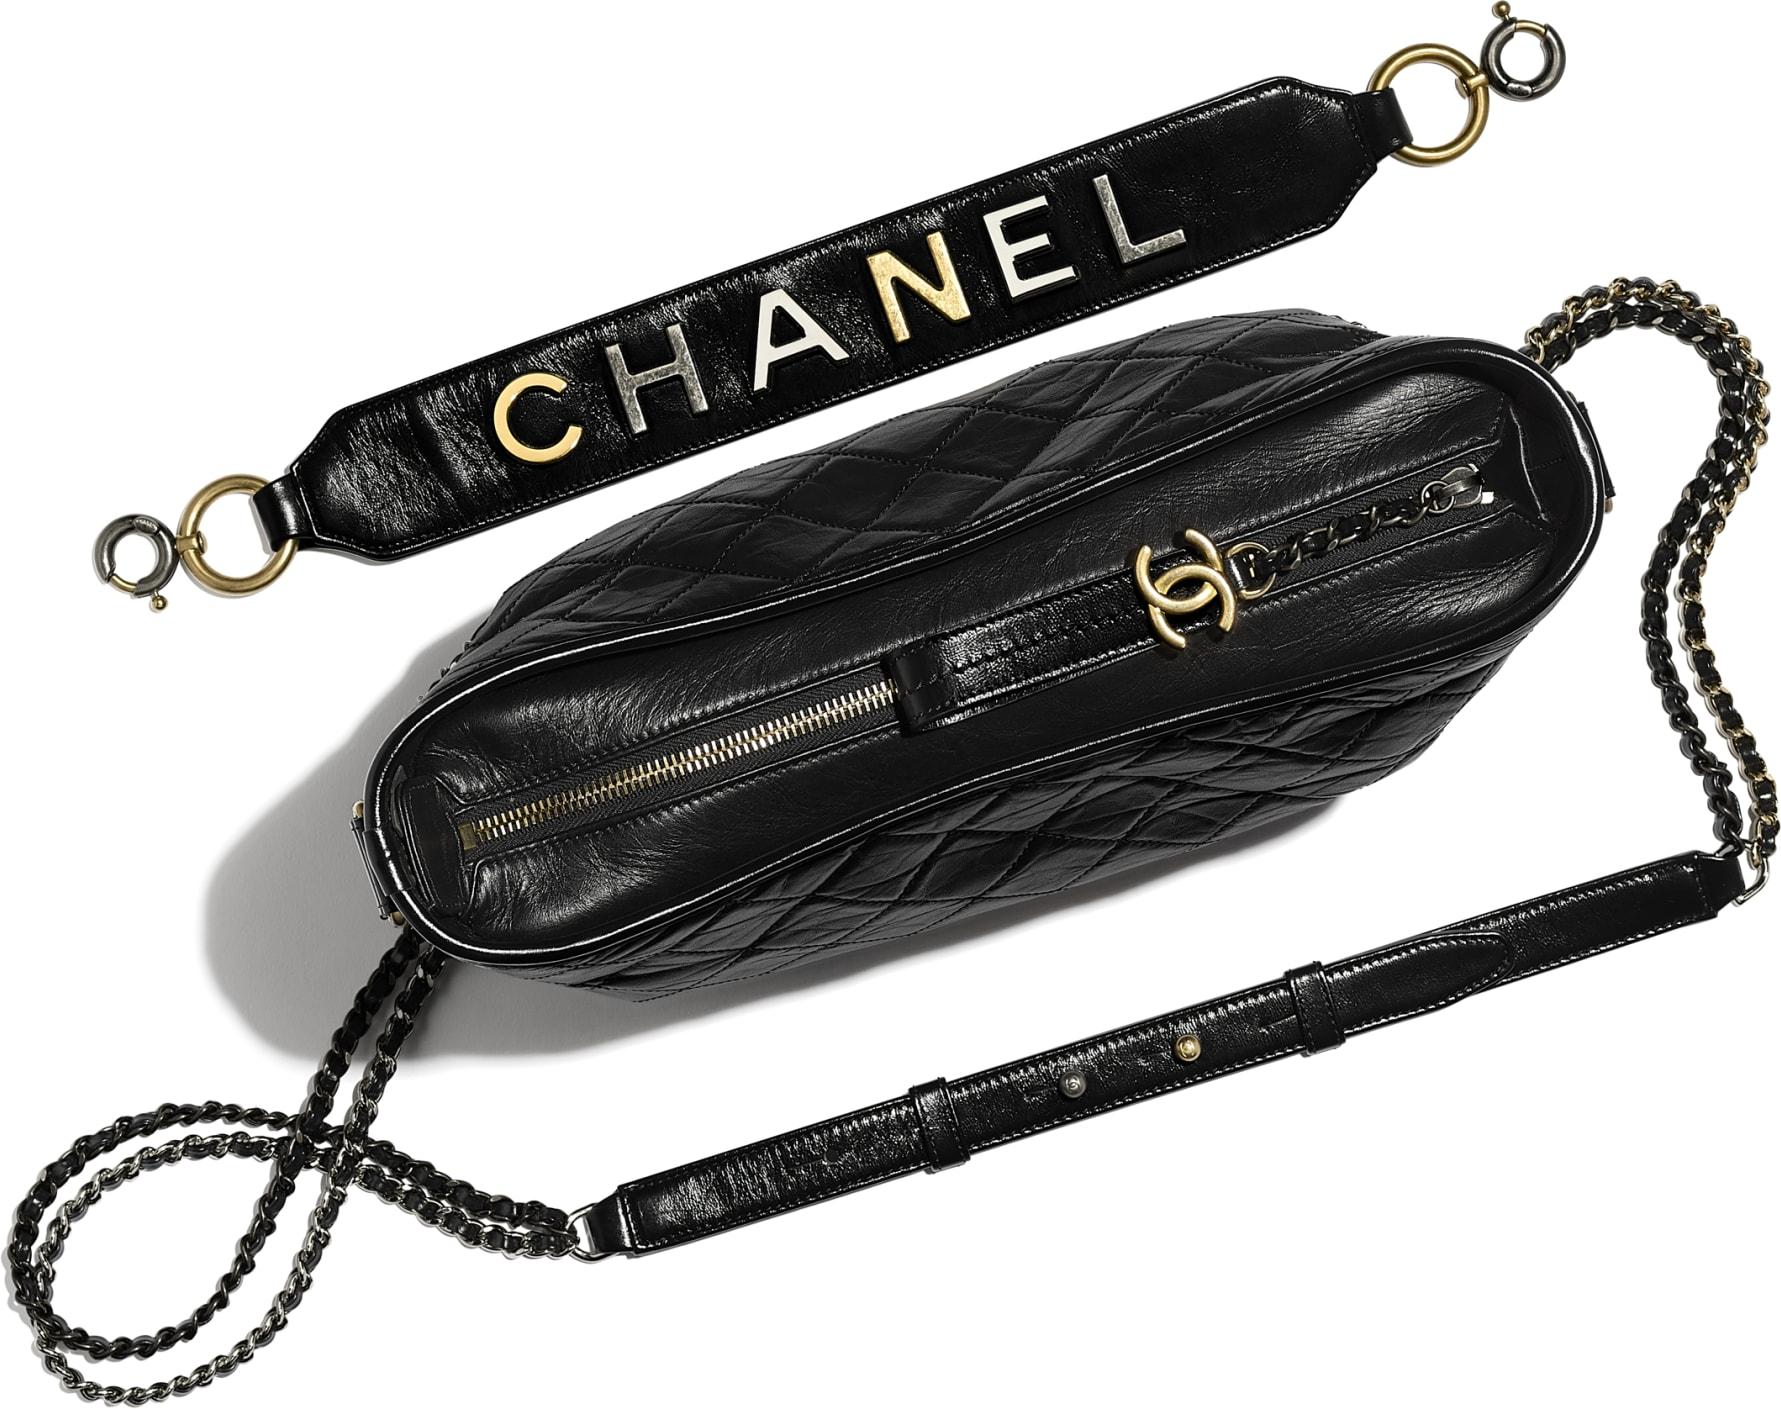 CHANEL'S GABRIELLE Large Hobo Bag